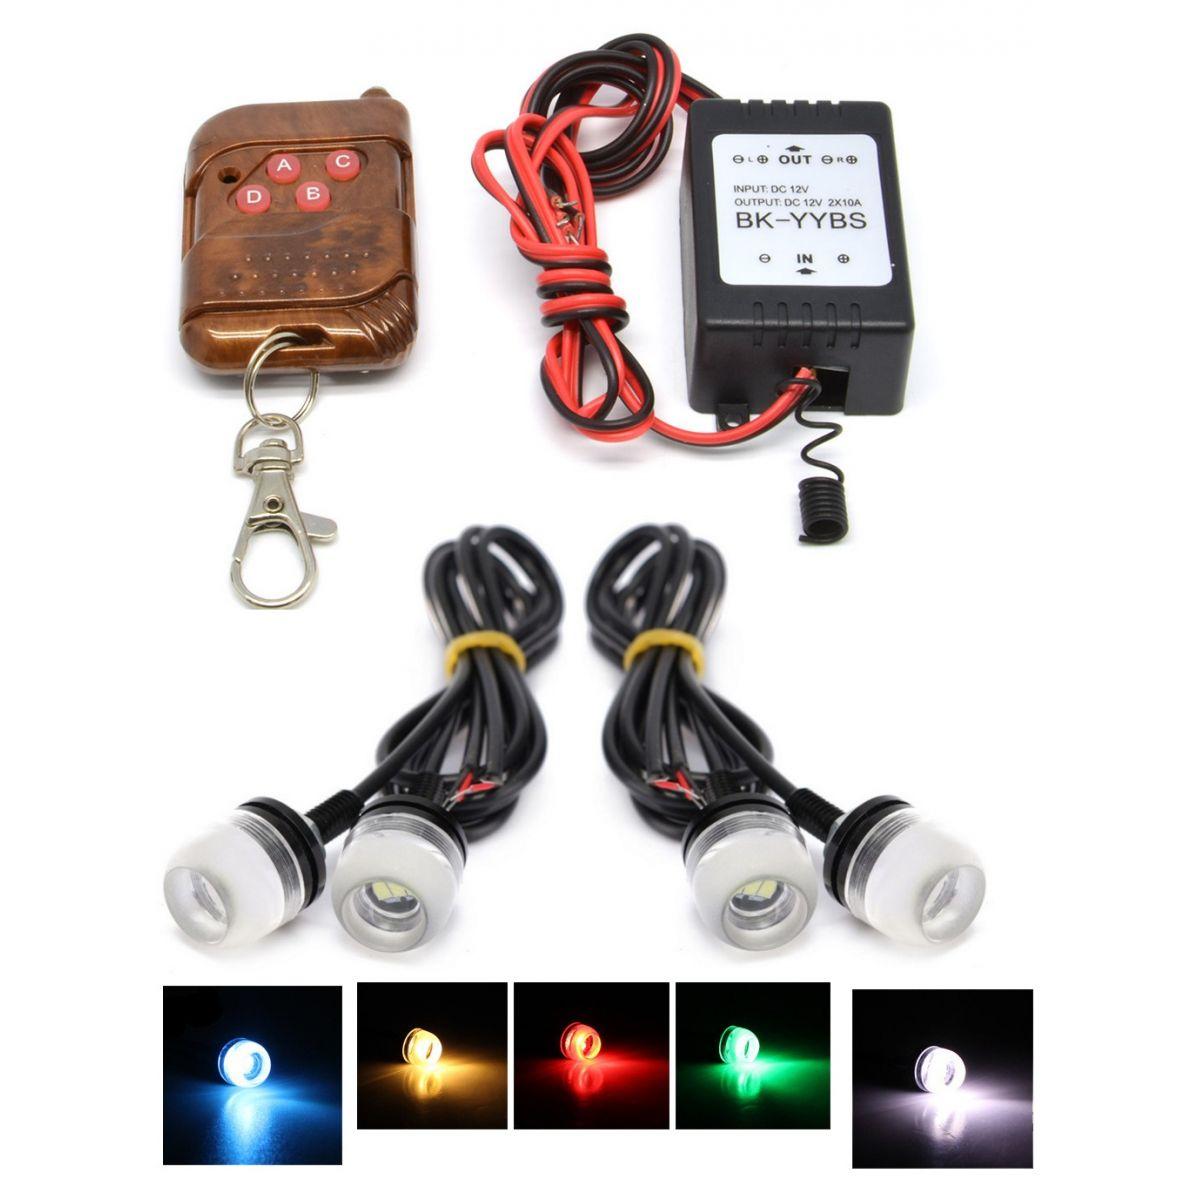 Kit Milha Strobo Controle S/Fio 4 Leds Coloridos DRL Vermelha